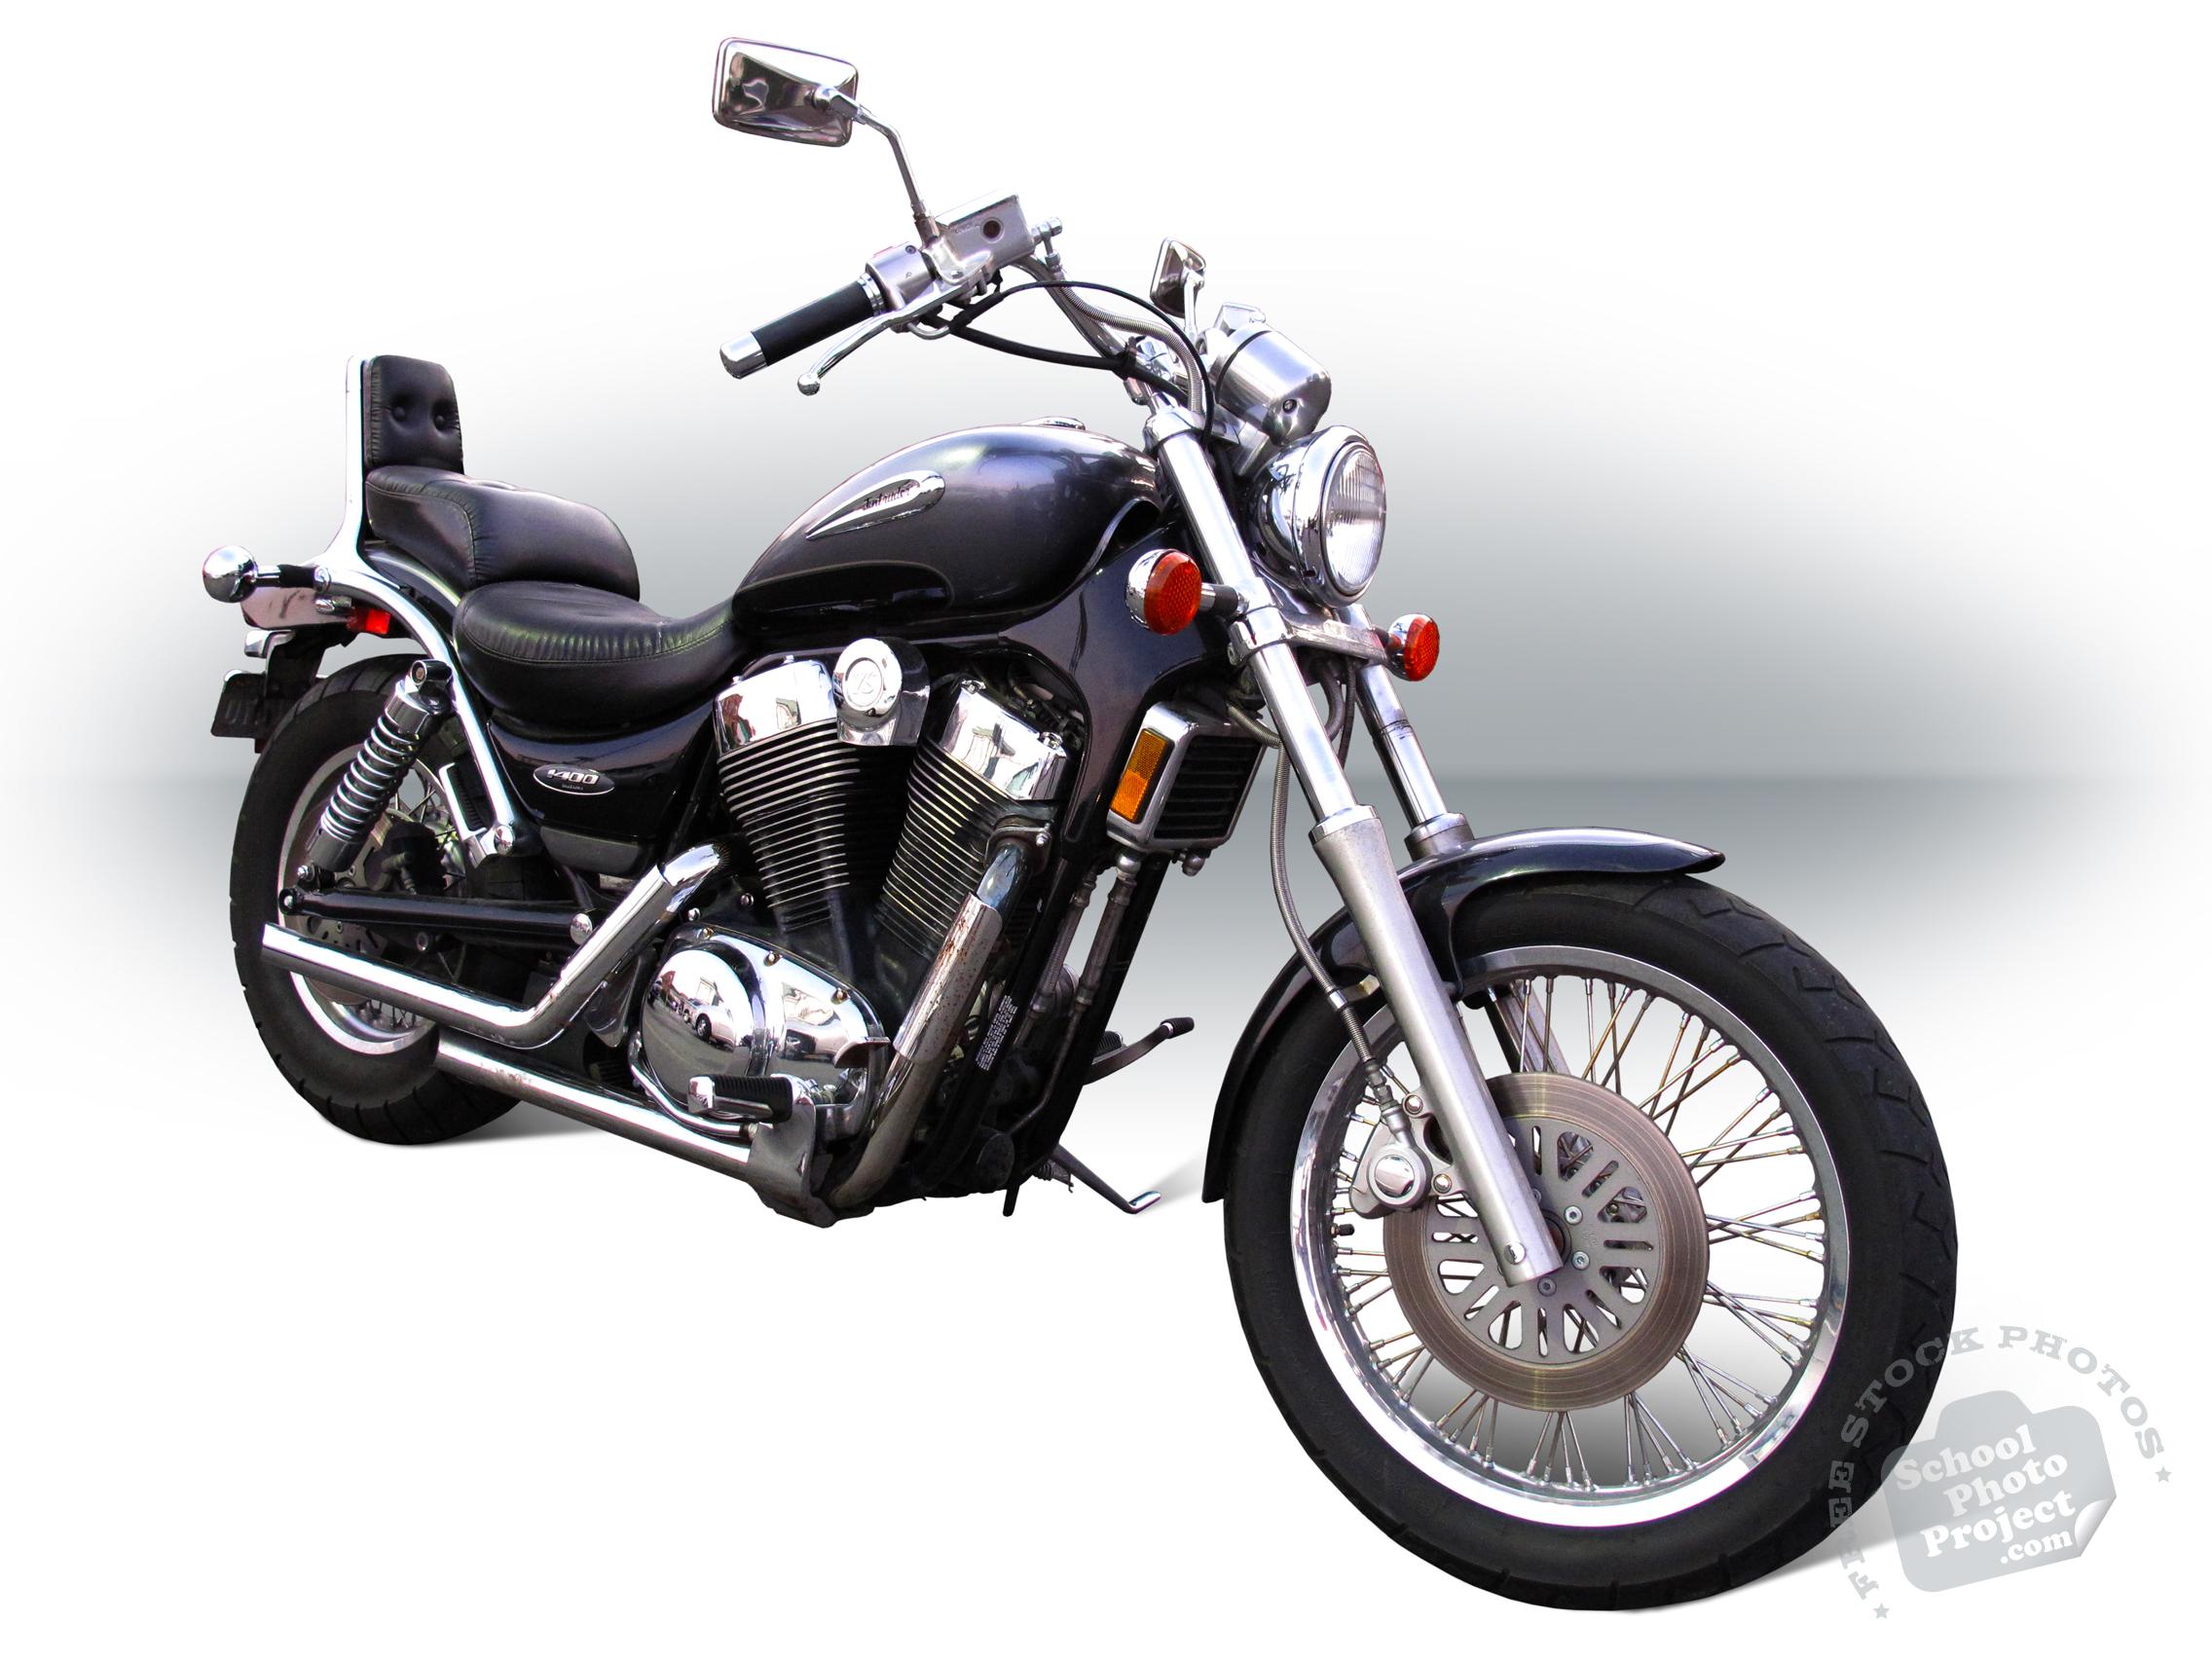 Suzuki Kawasaki, FREE Stock Photo, Image, Picture: Kawasaki Intruder